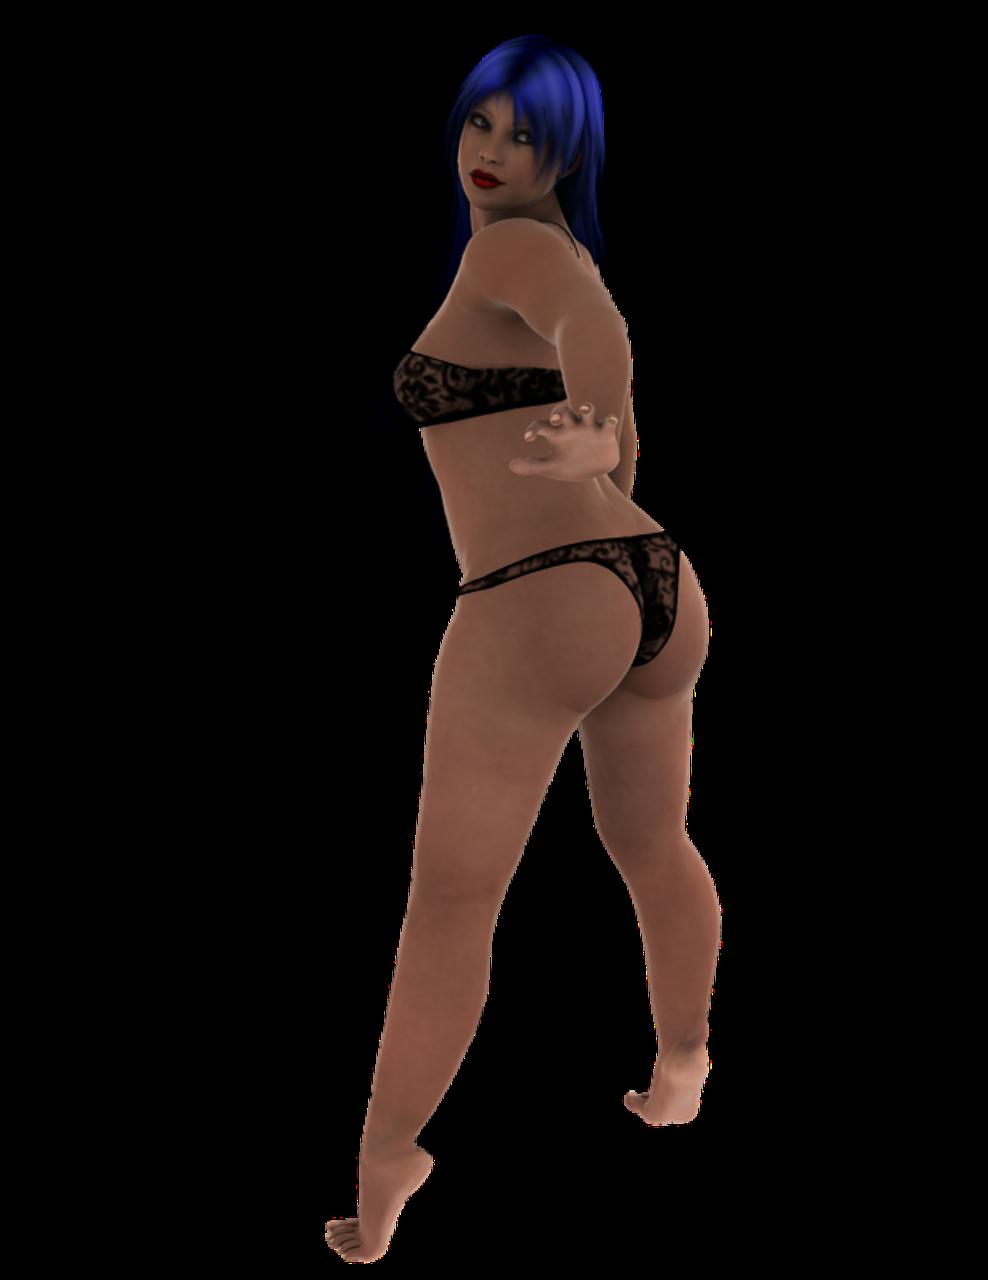 Bbw Bikini Tube